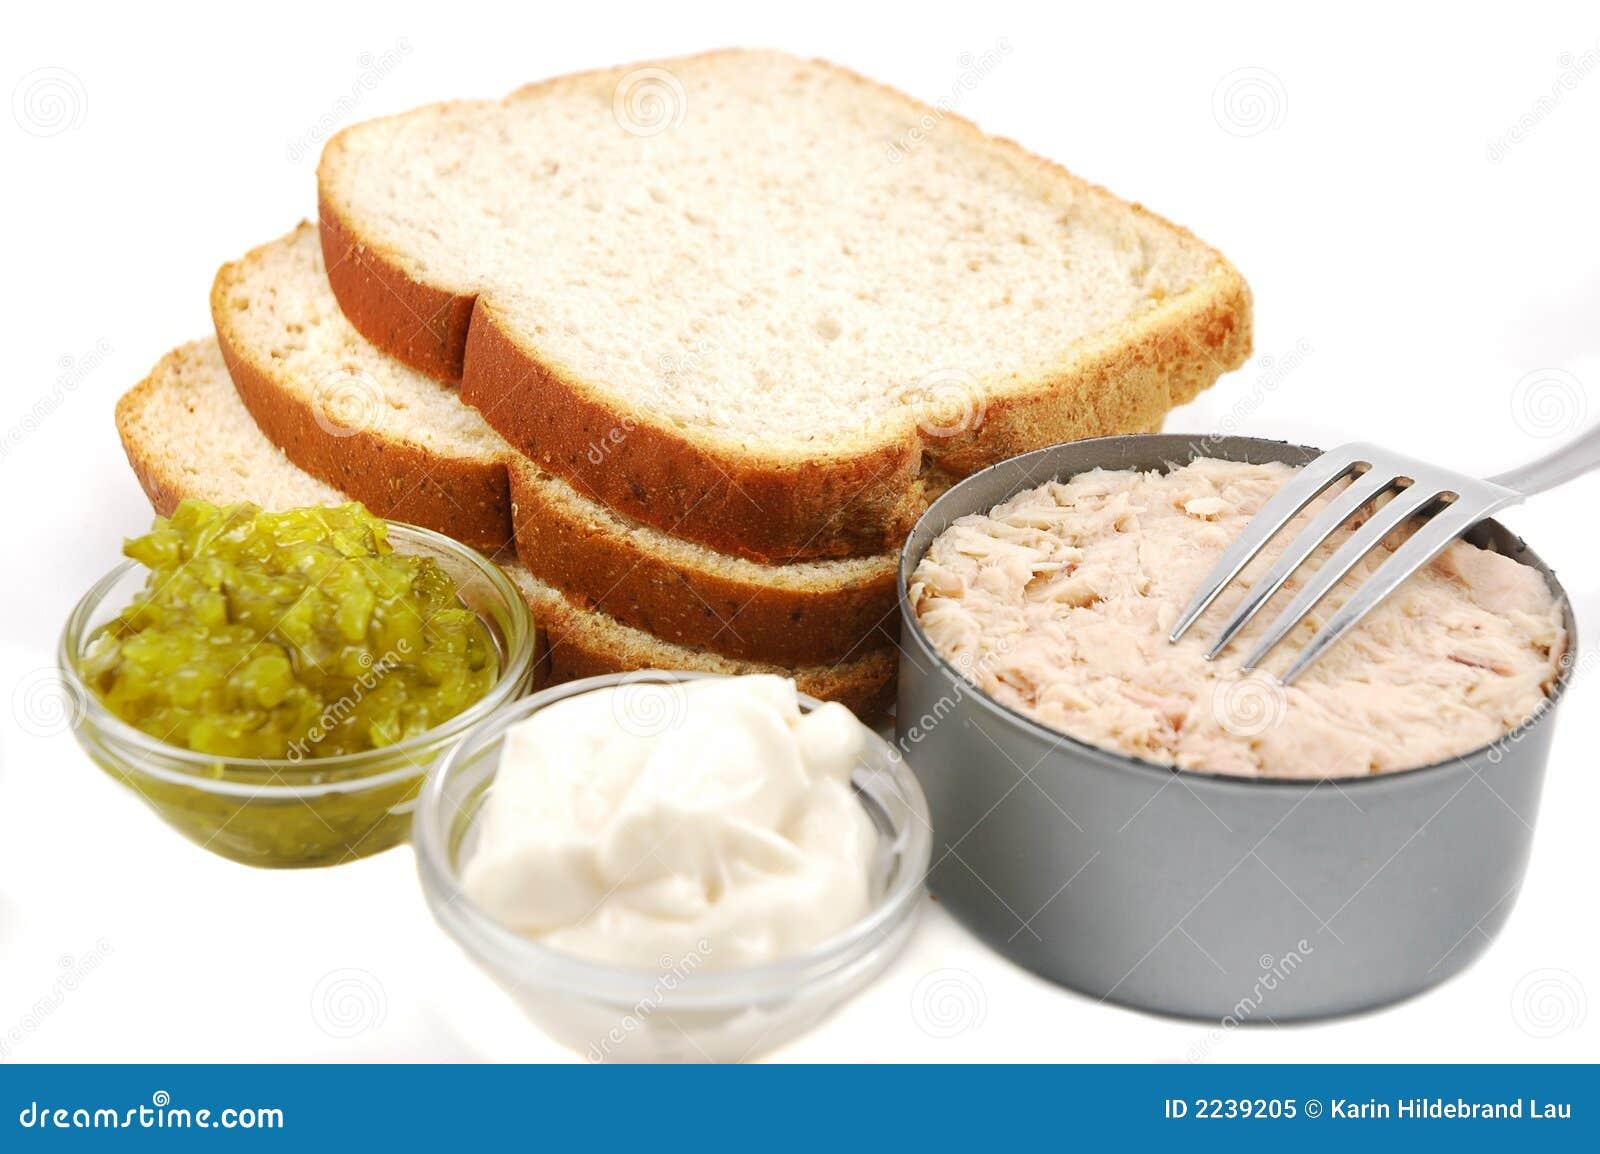 Tuna sandwich ingredients royalty free stock photo image for Making tuna fish